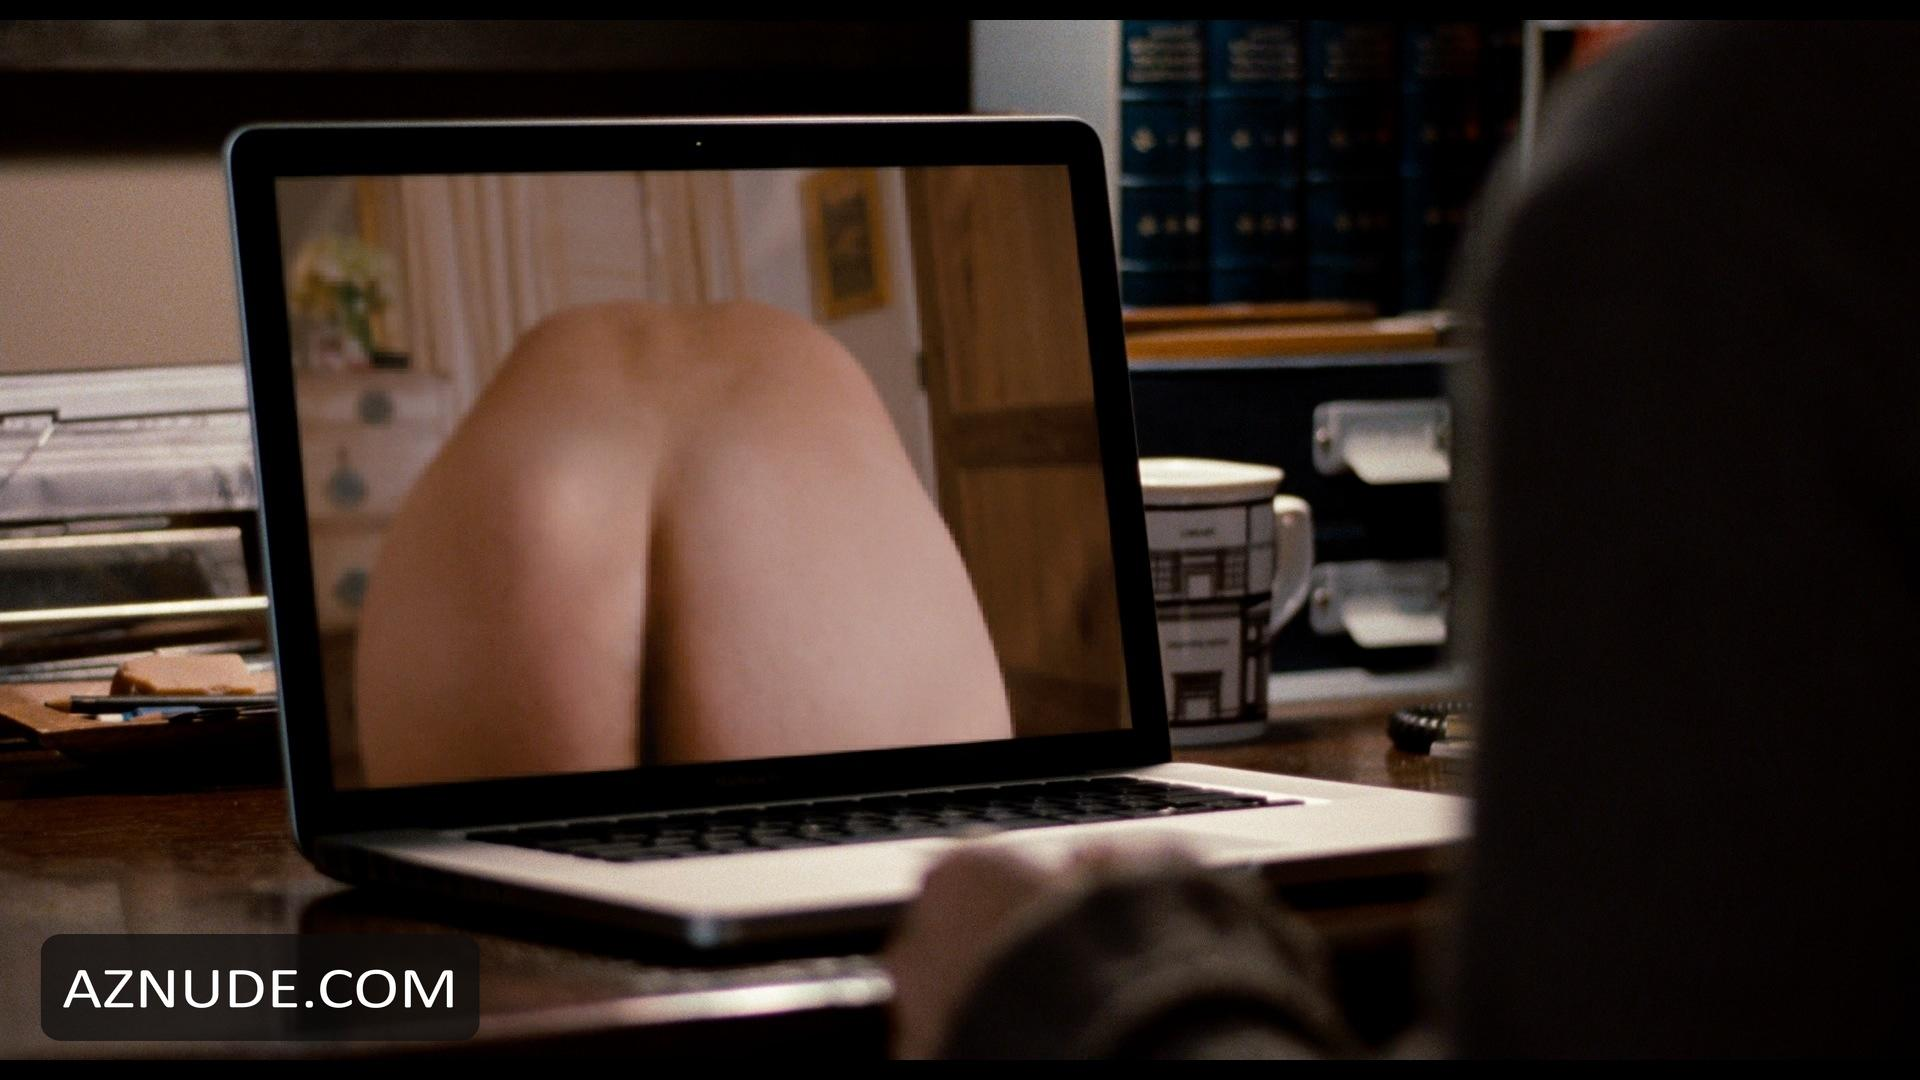 Nude female art erotica photographs women